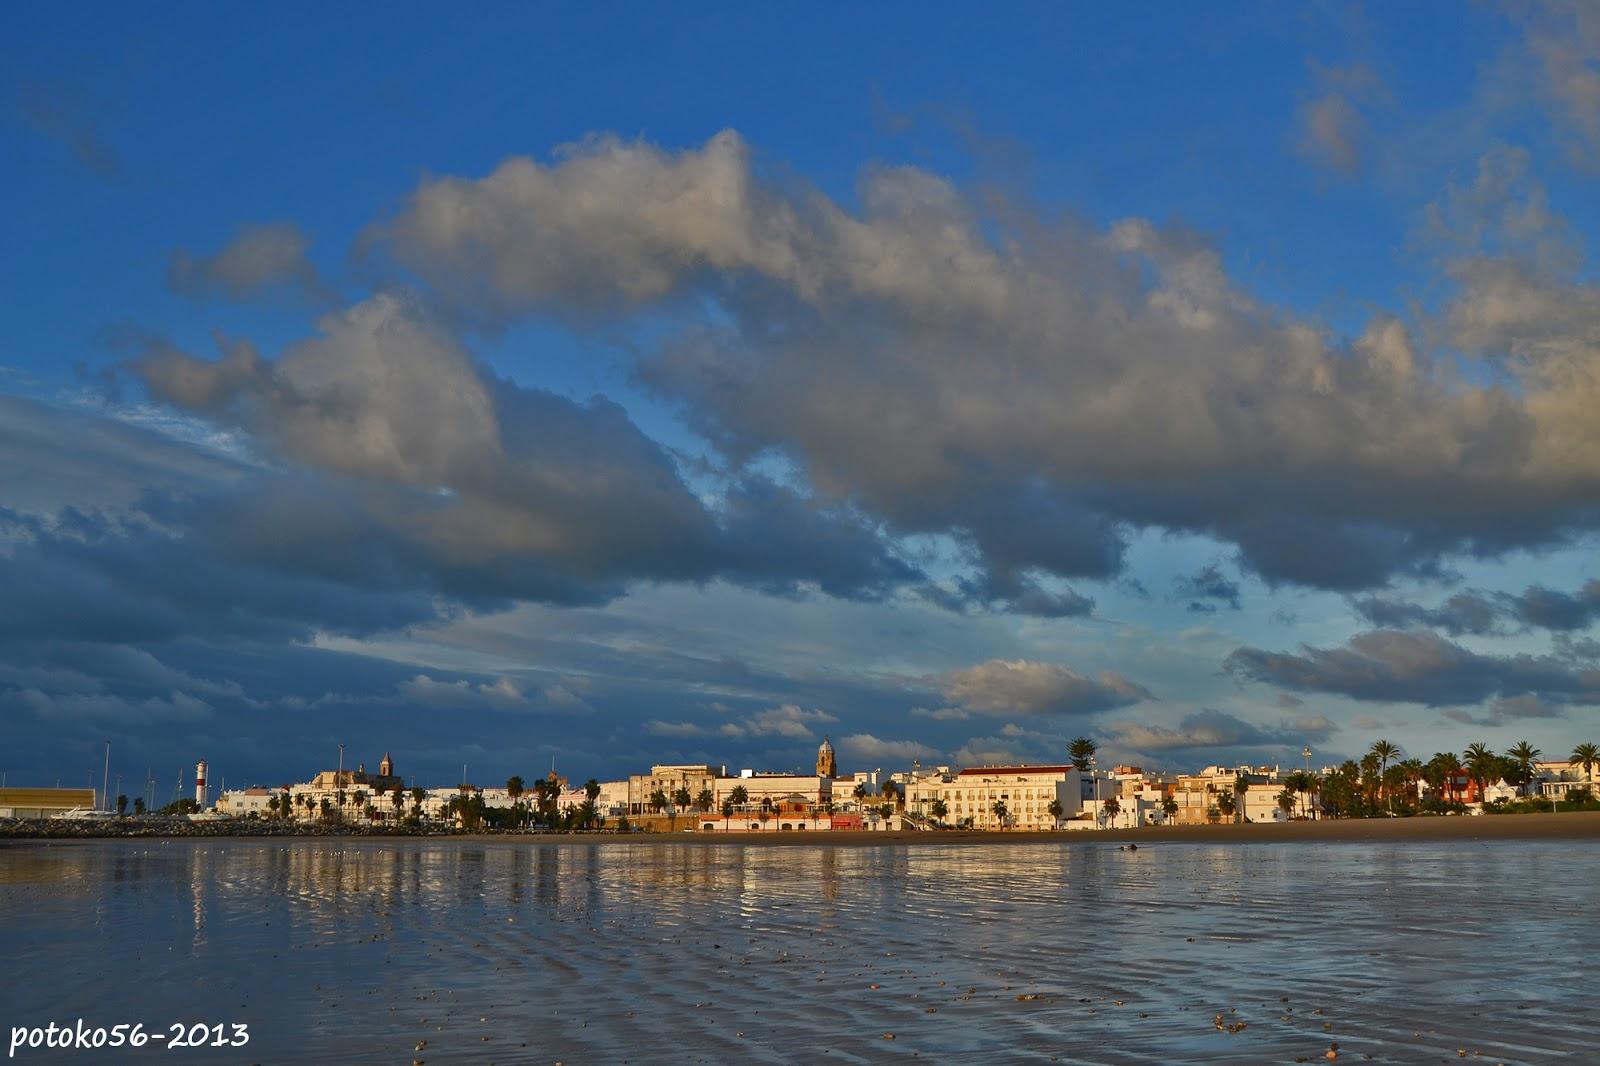 La playa del Chorrillo y Rota